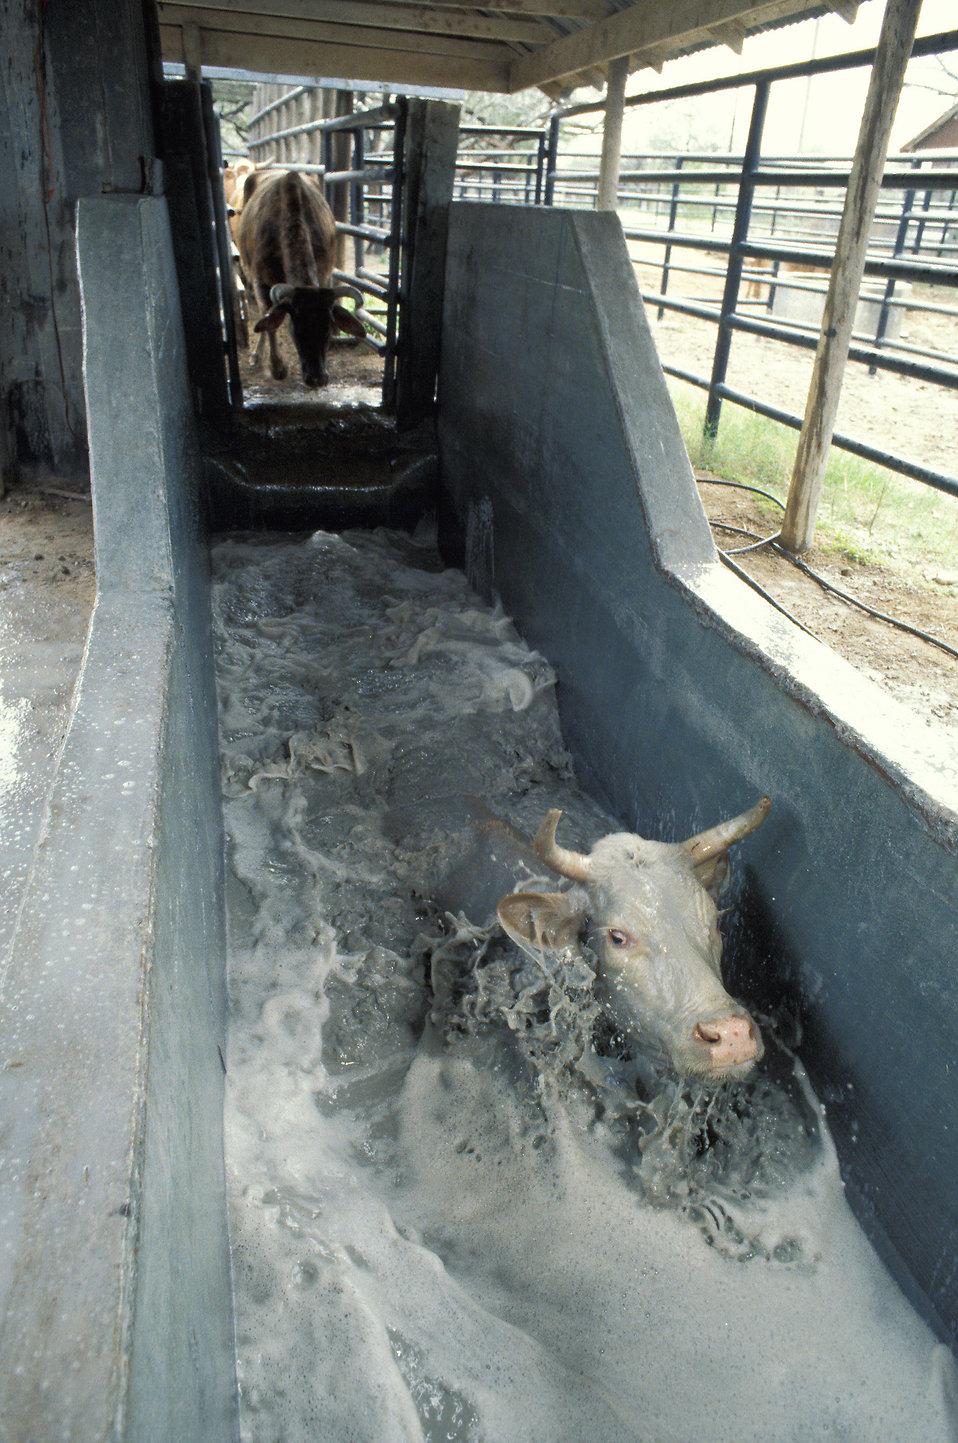 A cow in a tick treatment bath on a farm : Free Stock Photo